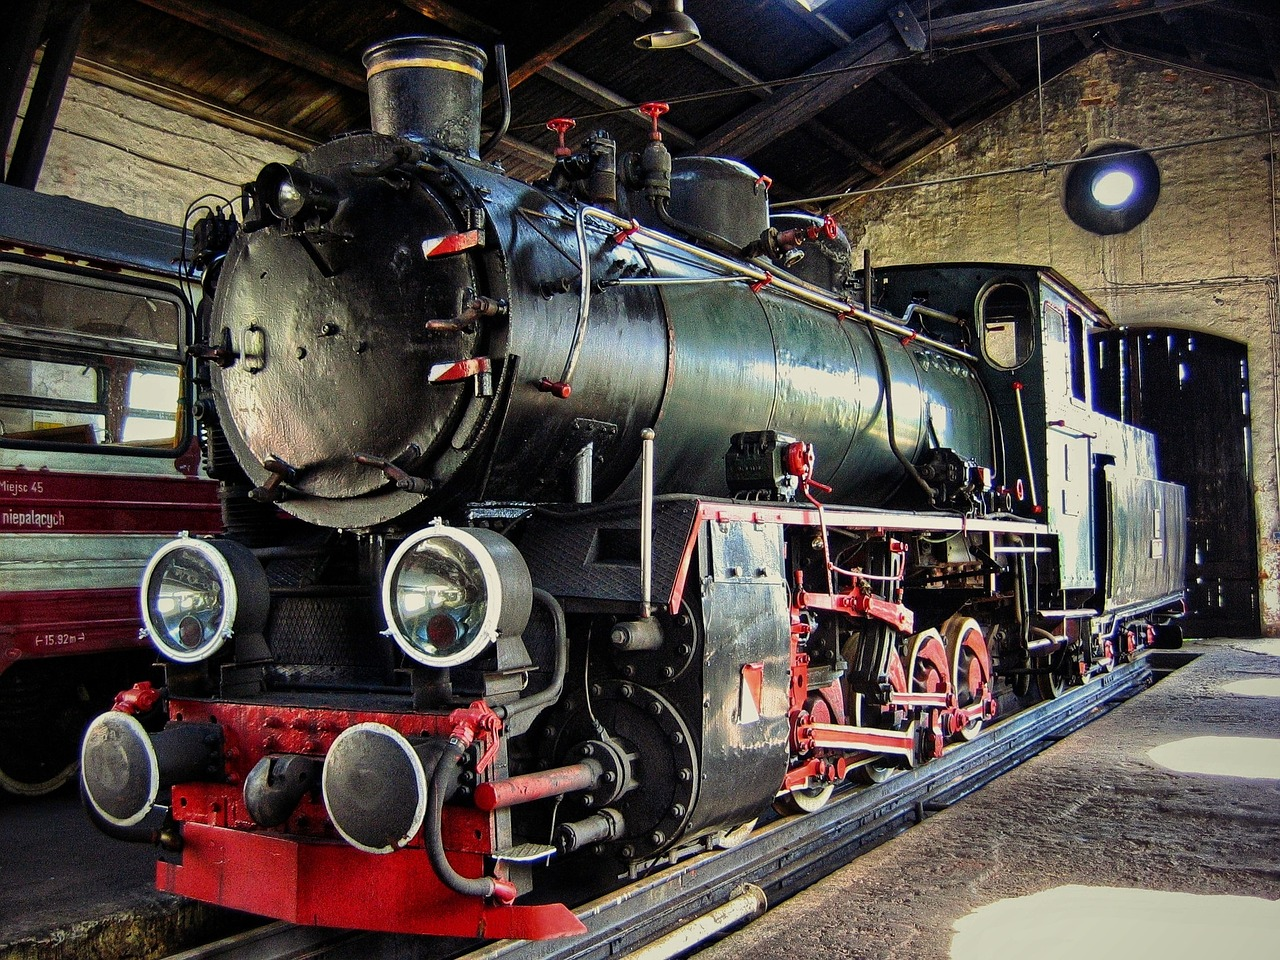 Locomotive,train,the roundhouse,the museum,steam locomotive